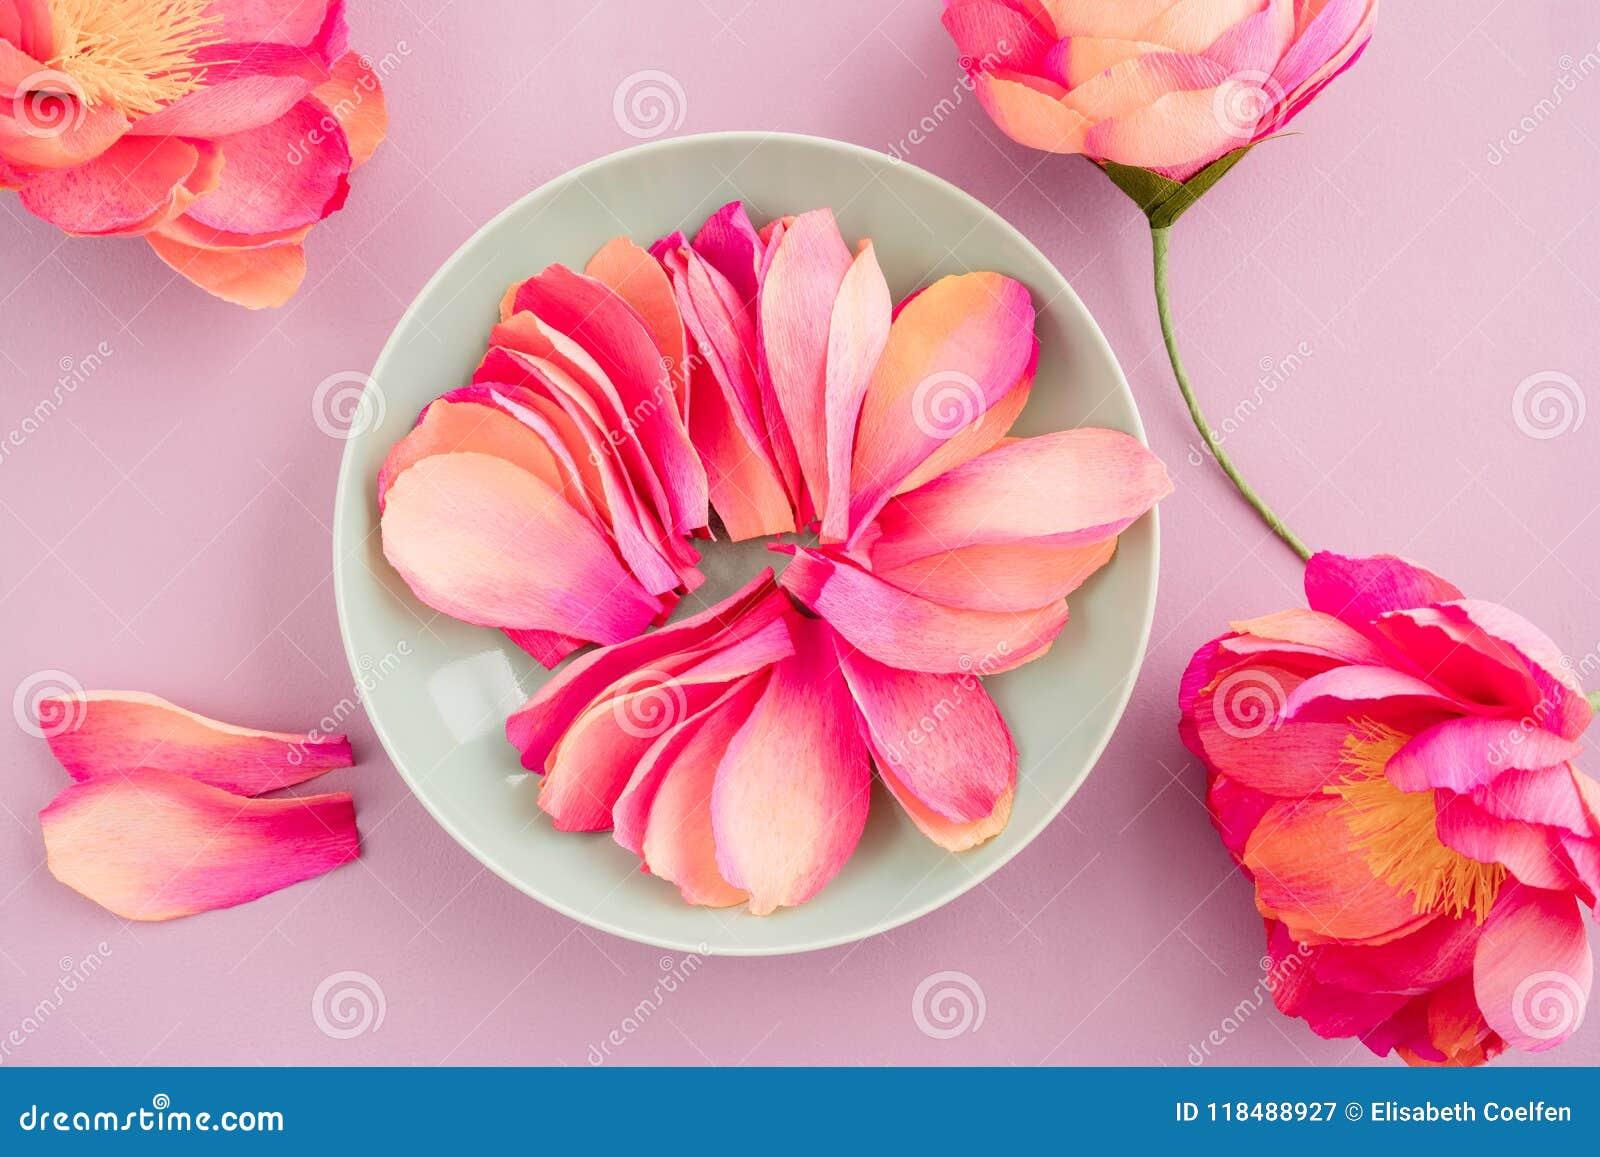 Crepe Paper Peony Flowers Stock Image Image Of Overhead 118488927